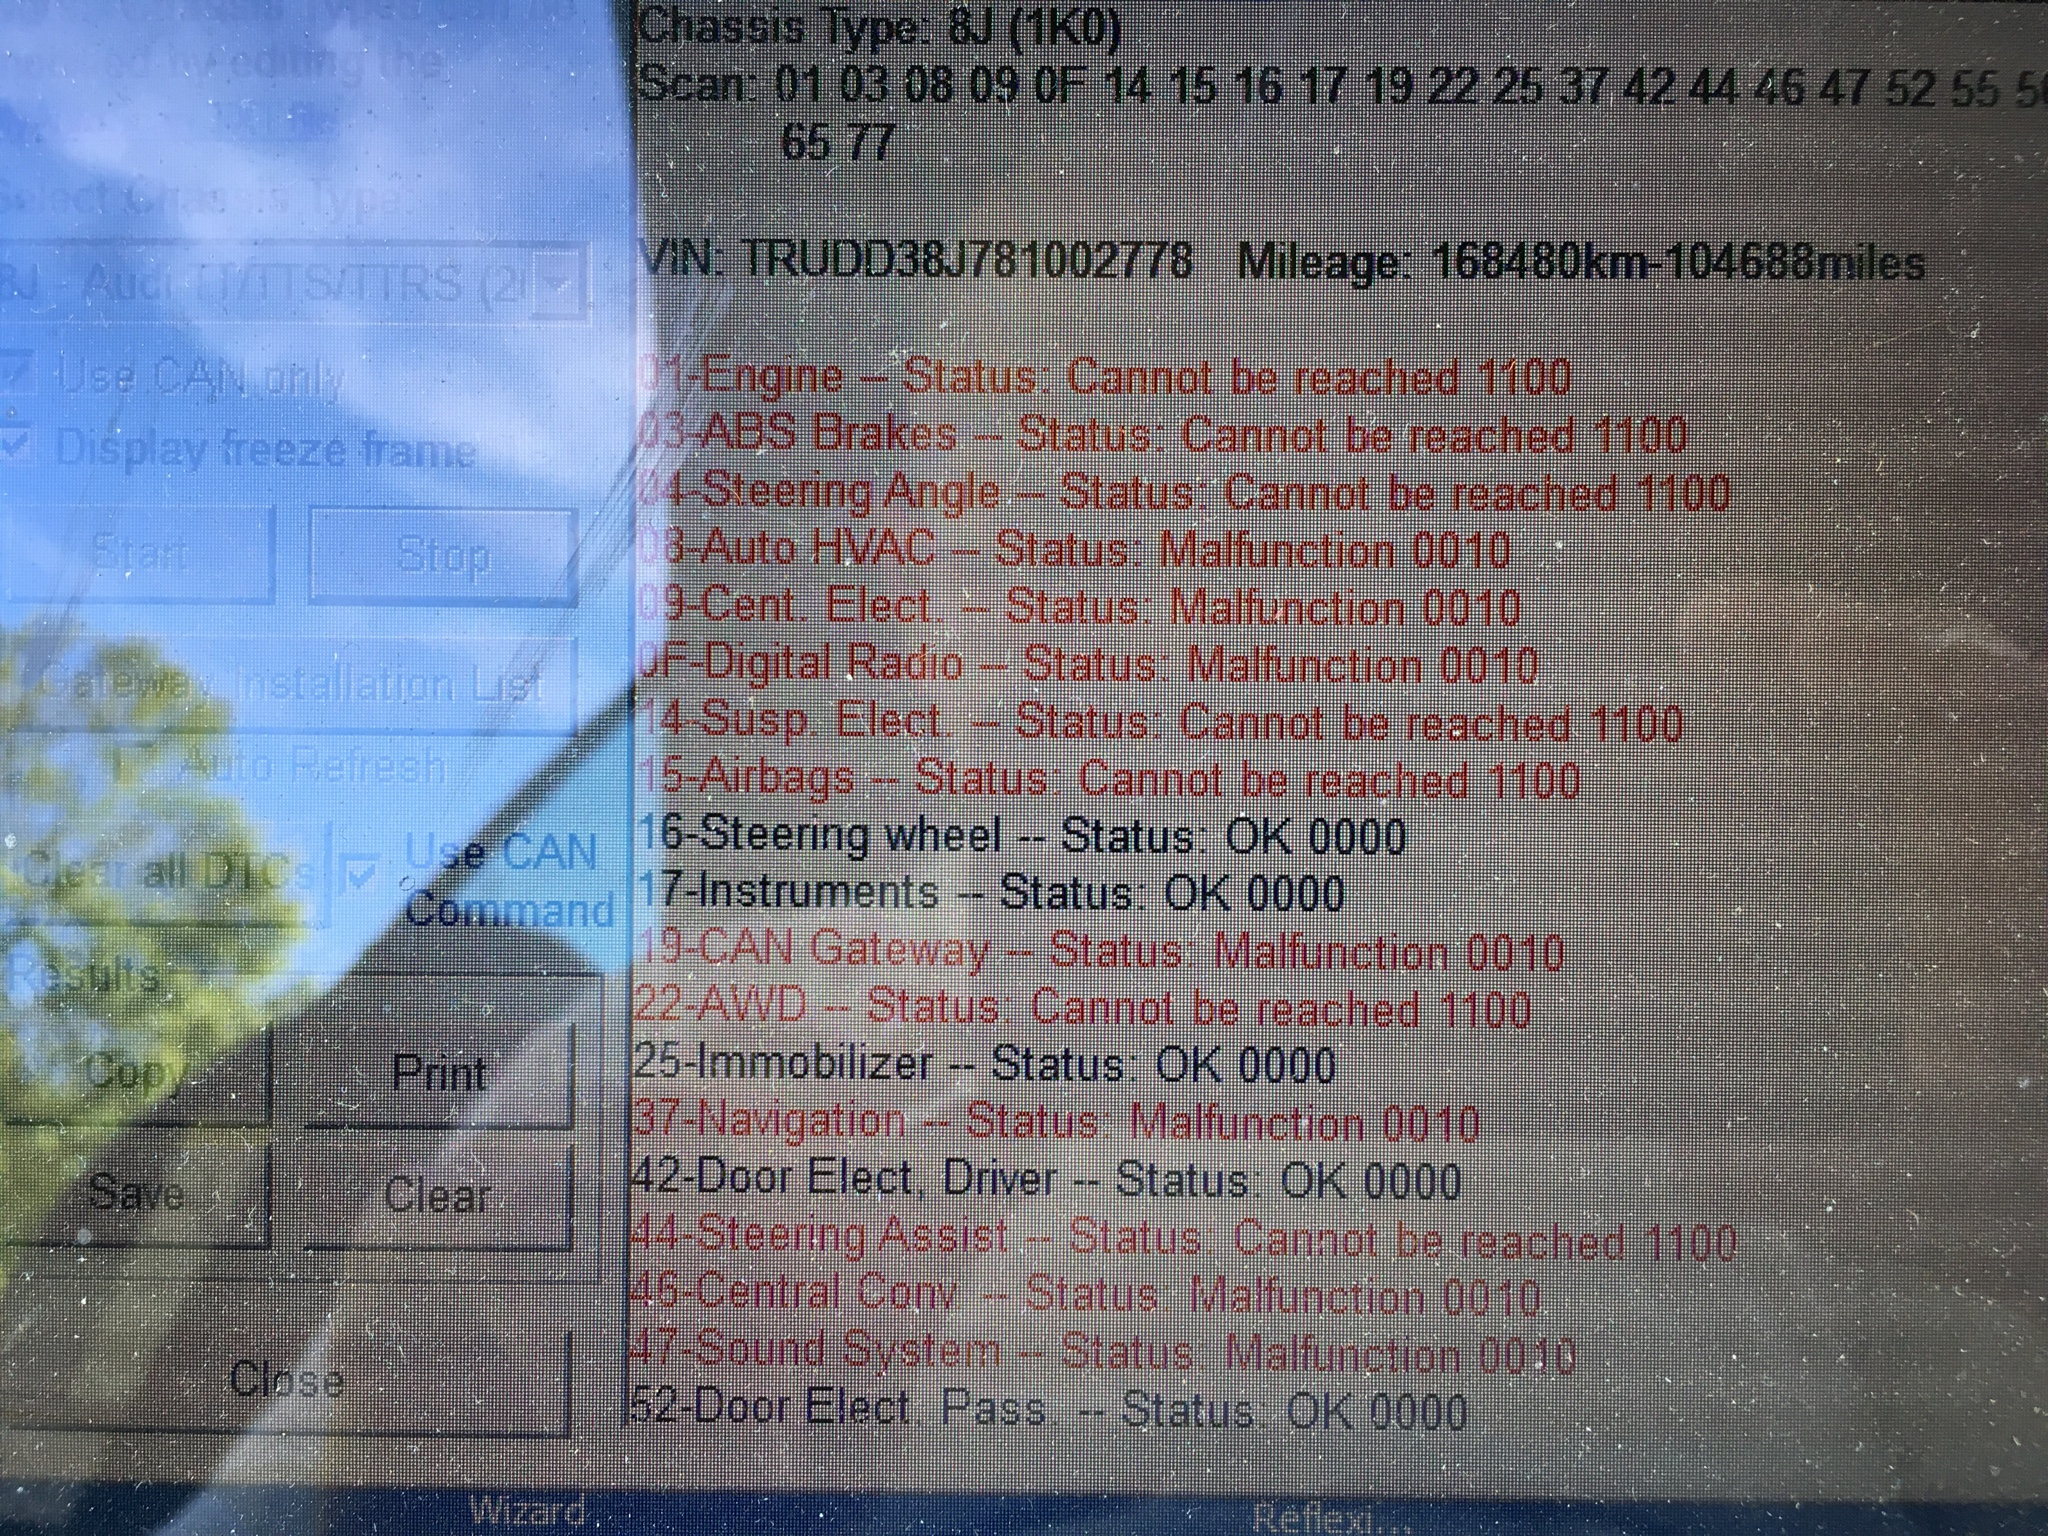 p0513 code reset